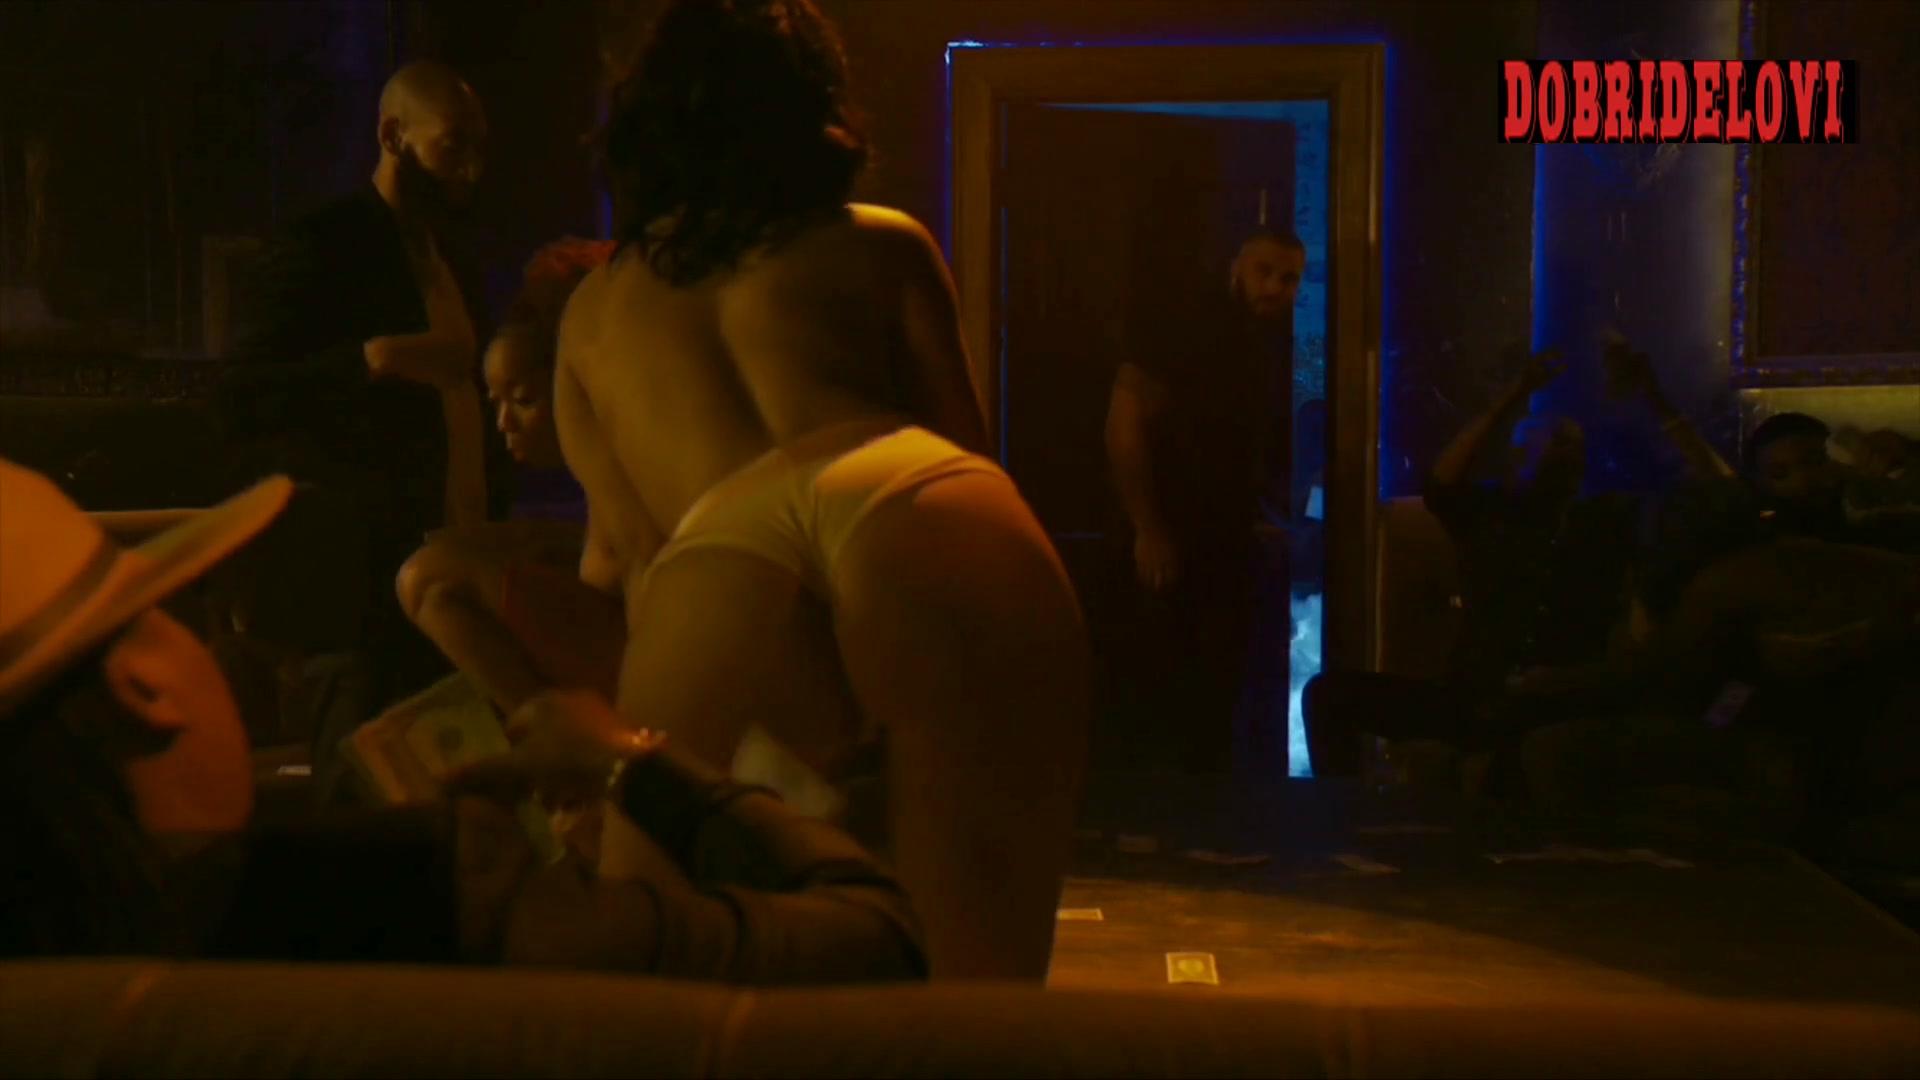 Elarica Johnson, Brandee Evans and Shannon Thornton dominatrix scene from P-Valley